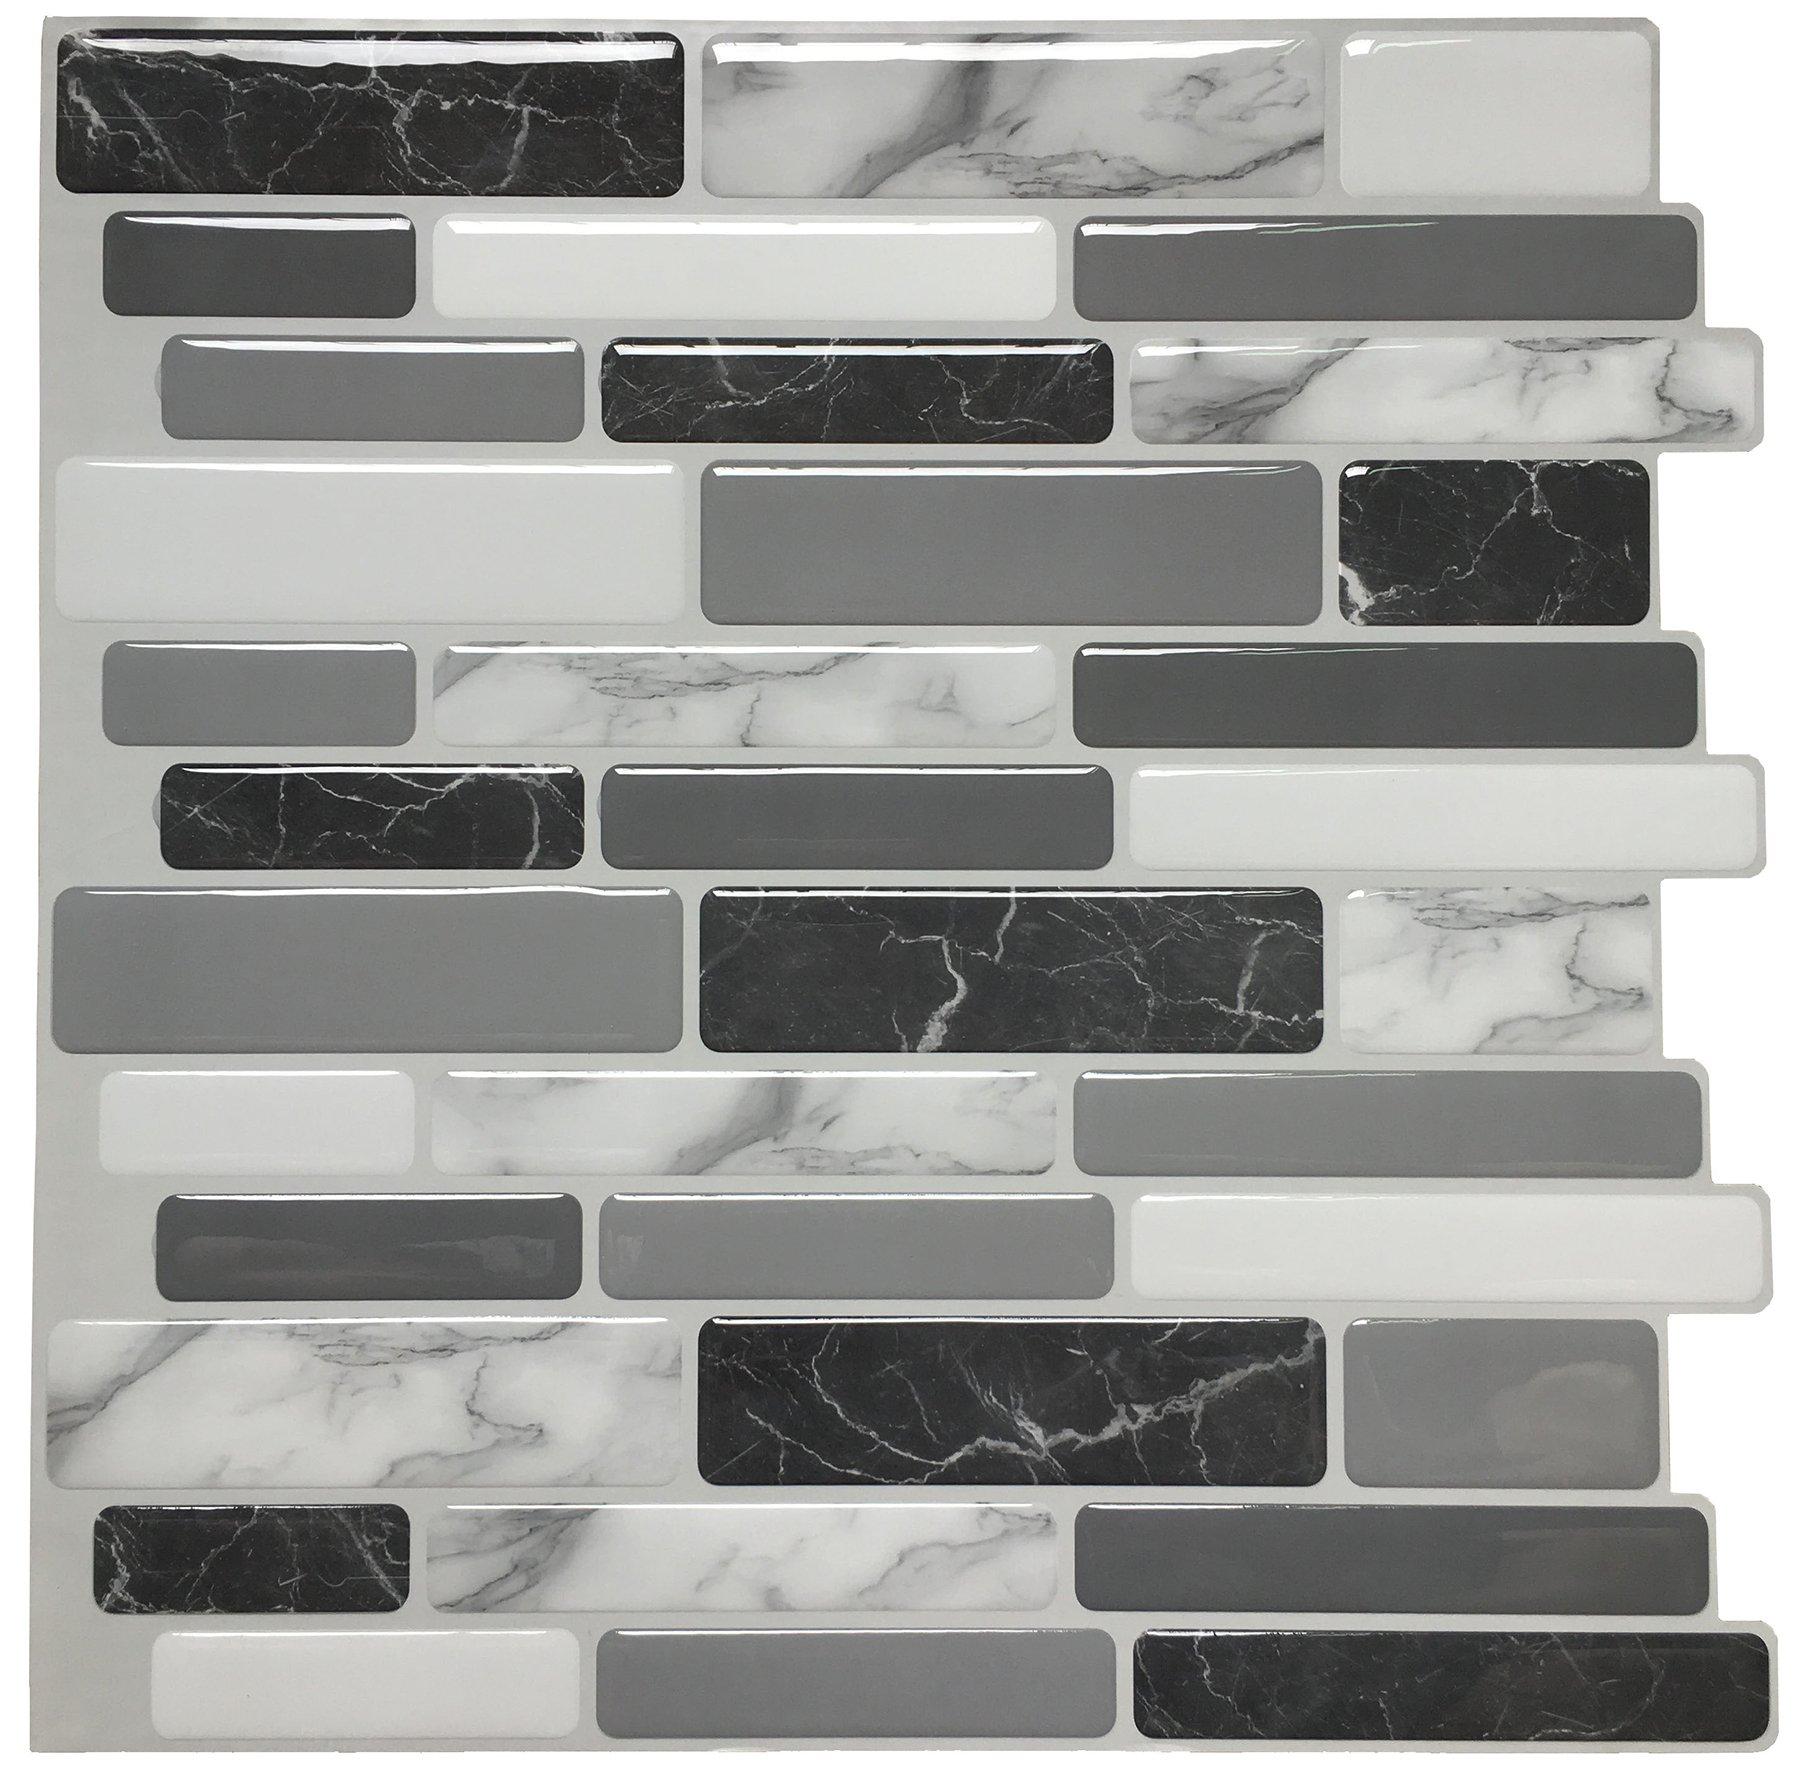 Art3d Peel and Stick Wall Tile for Kitchen Backsplash, 12''x12'', (10 Tiles)